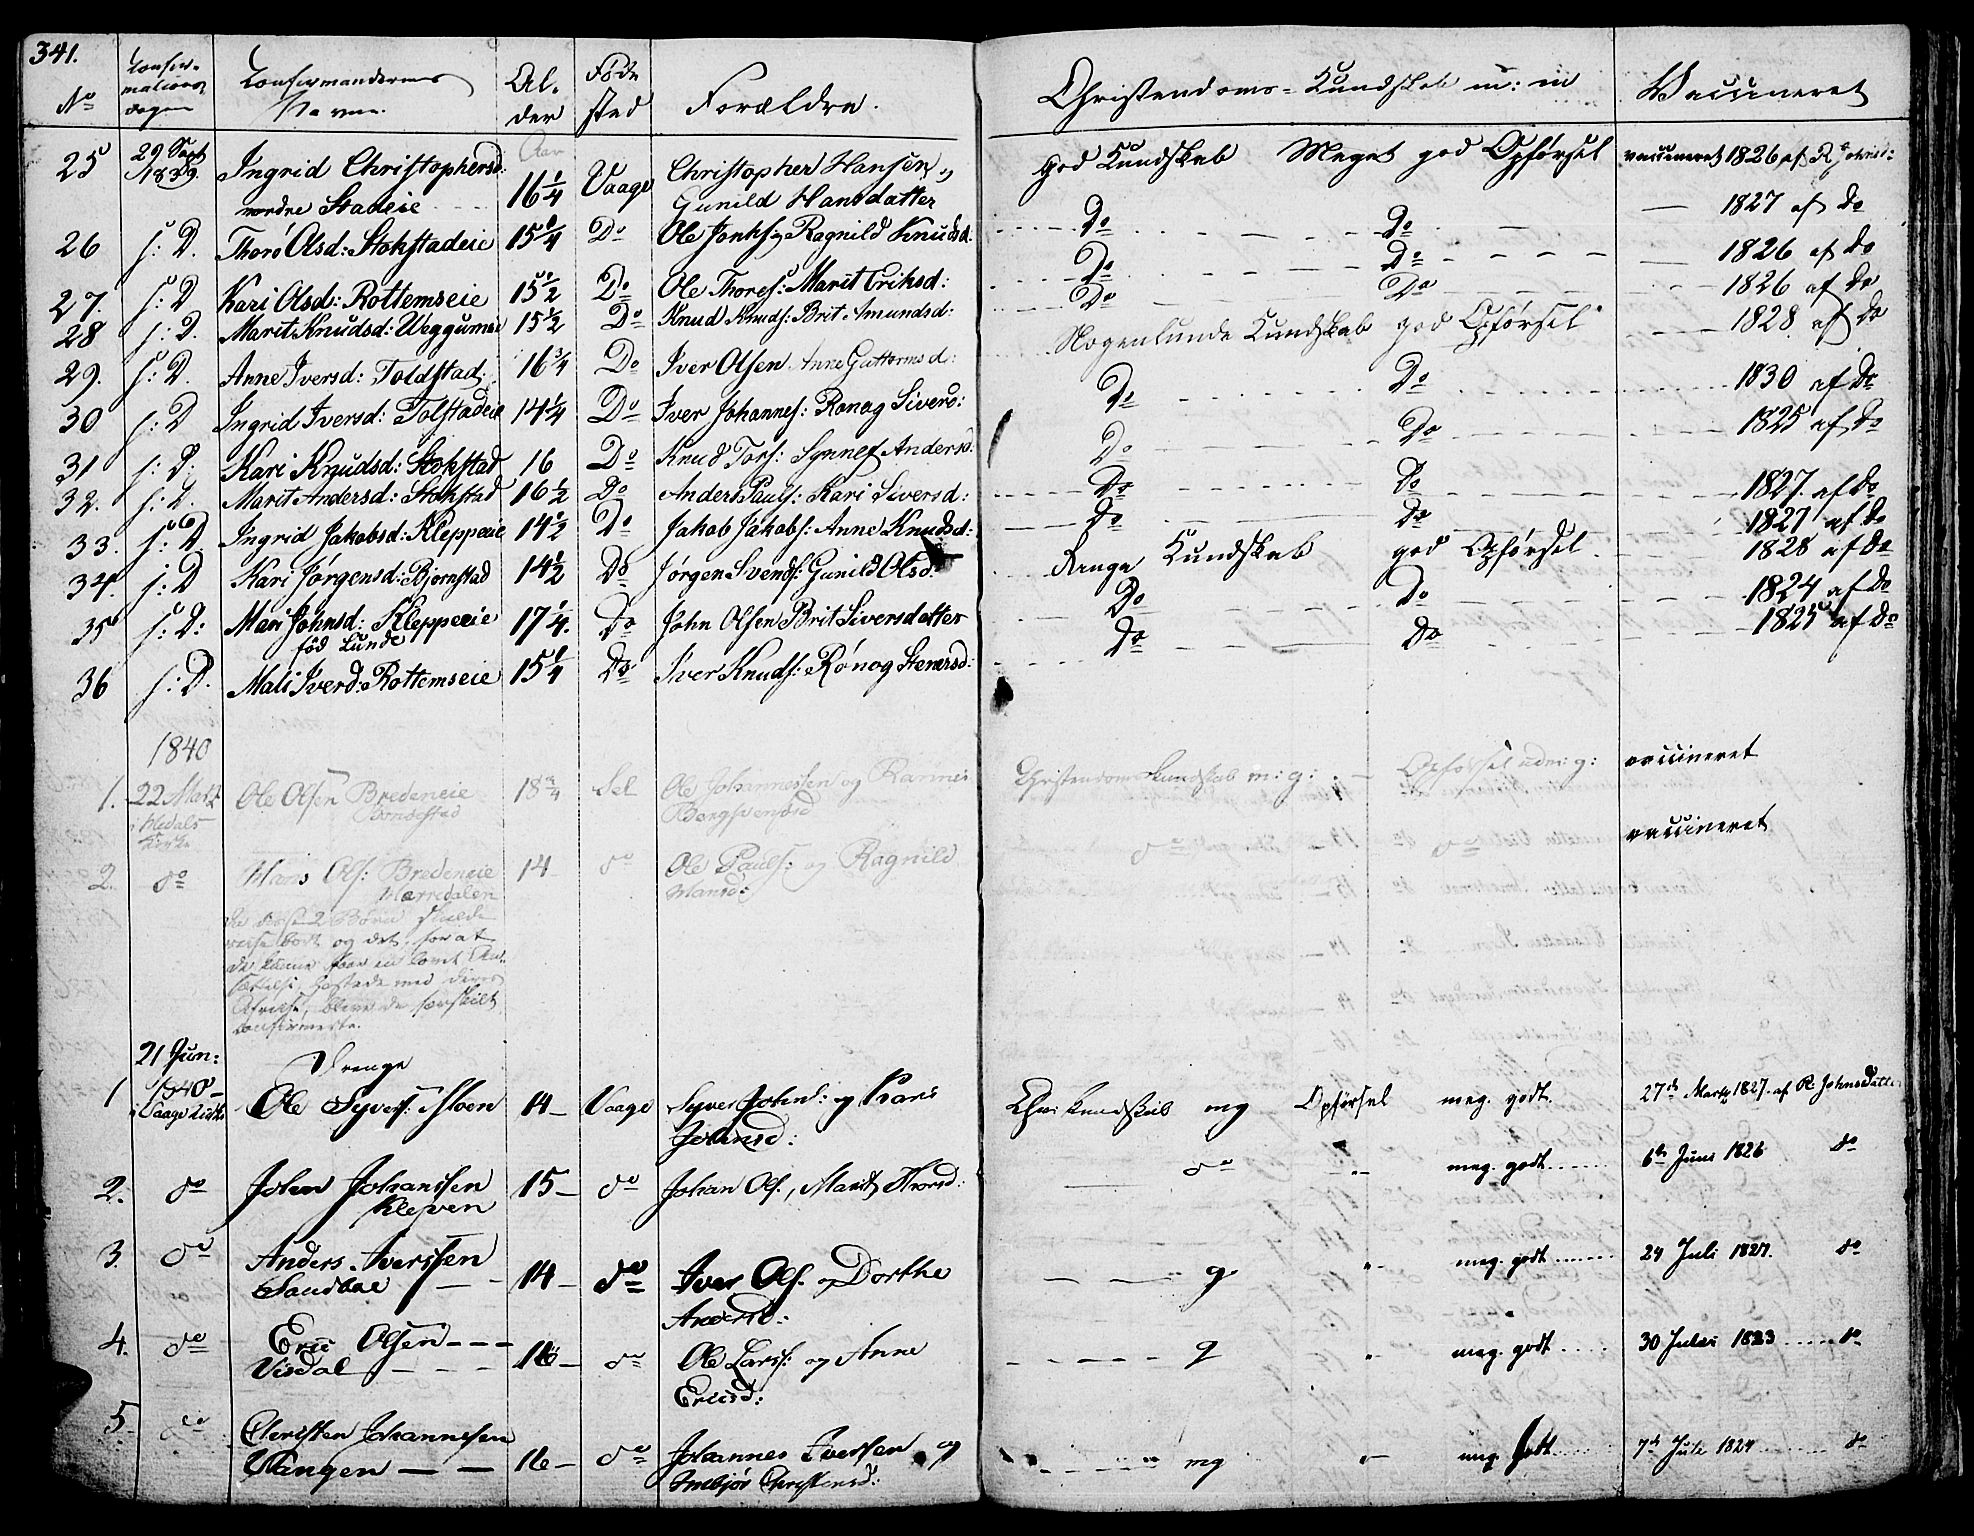 SAH, Vågå prestekontor, Ministerialbok nr. 4 /1, 1827-1842, s. 341